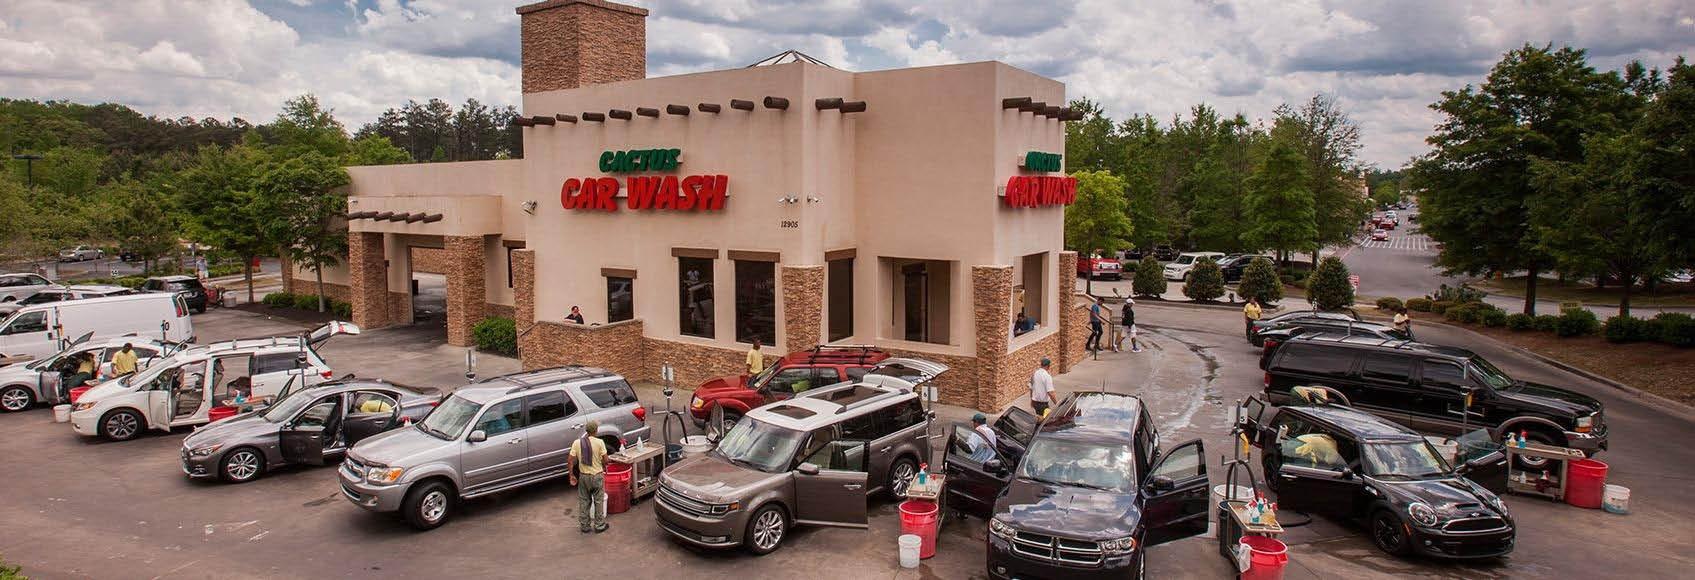 Cactus Car Wash in Marietta, GA Banner ad